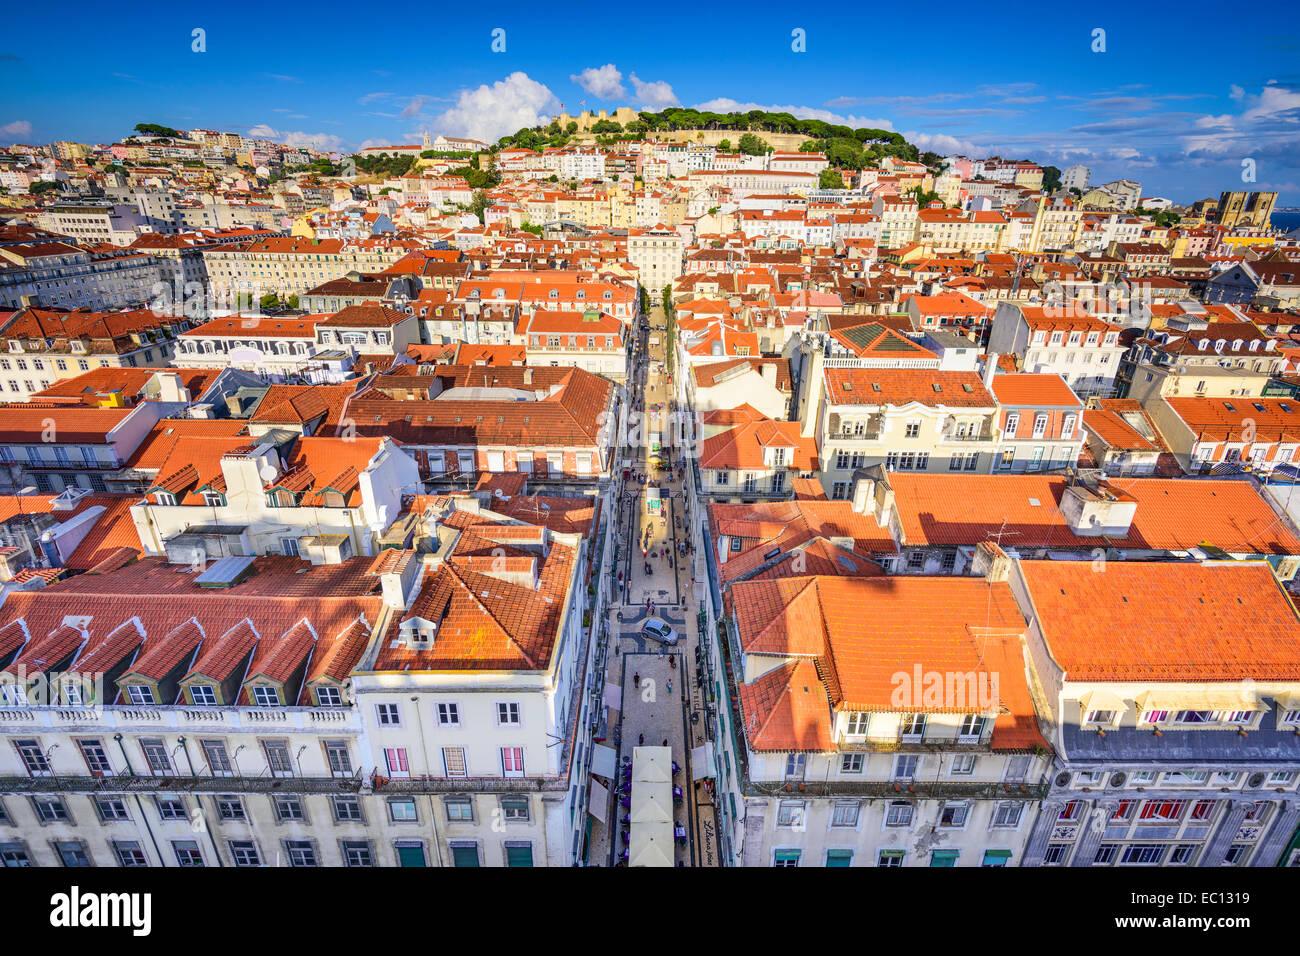 Lisbon, Portugal city skyline over Santa Justa Rua. - Stock Image